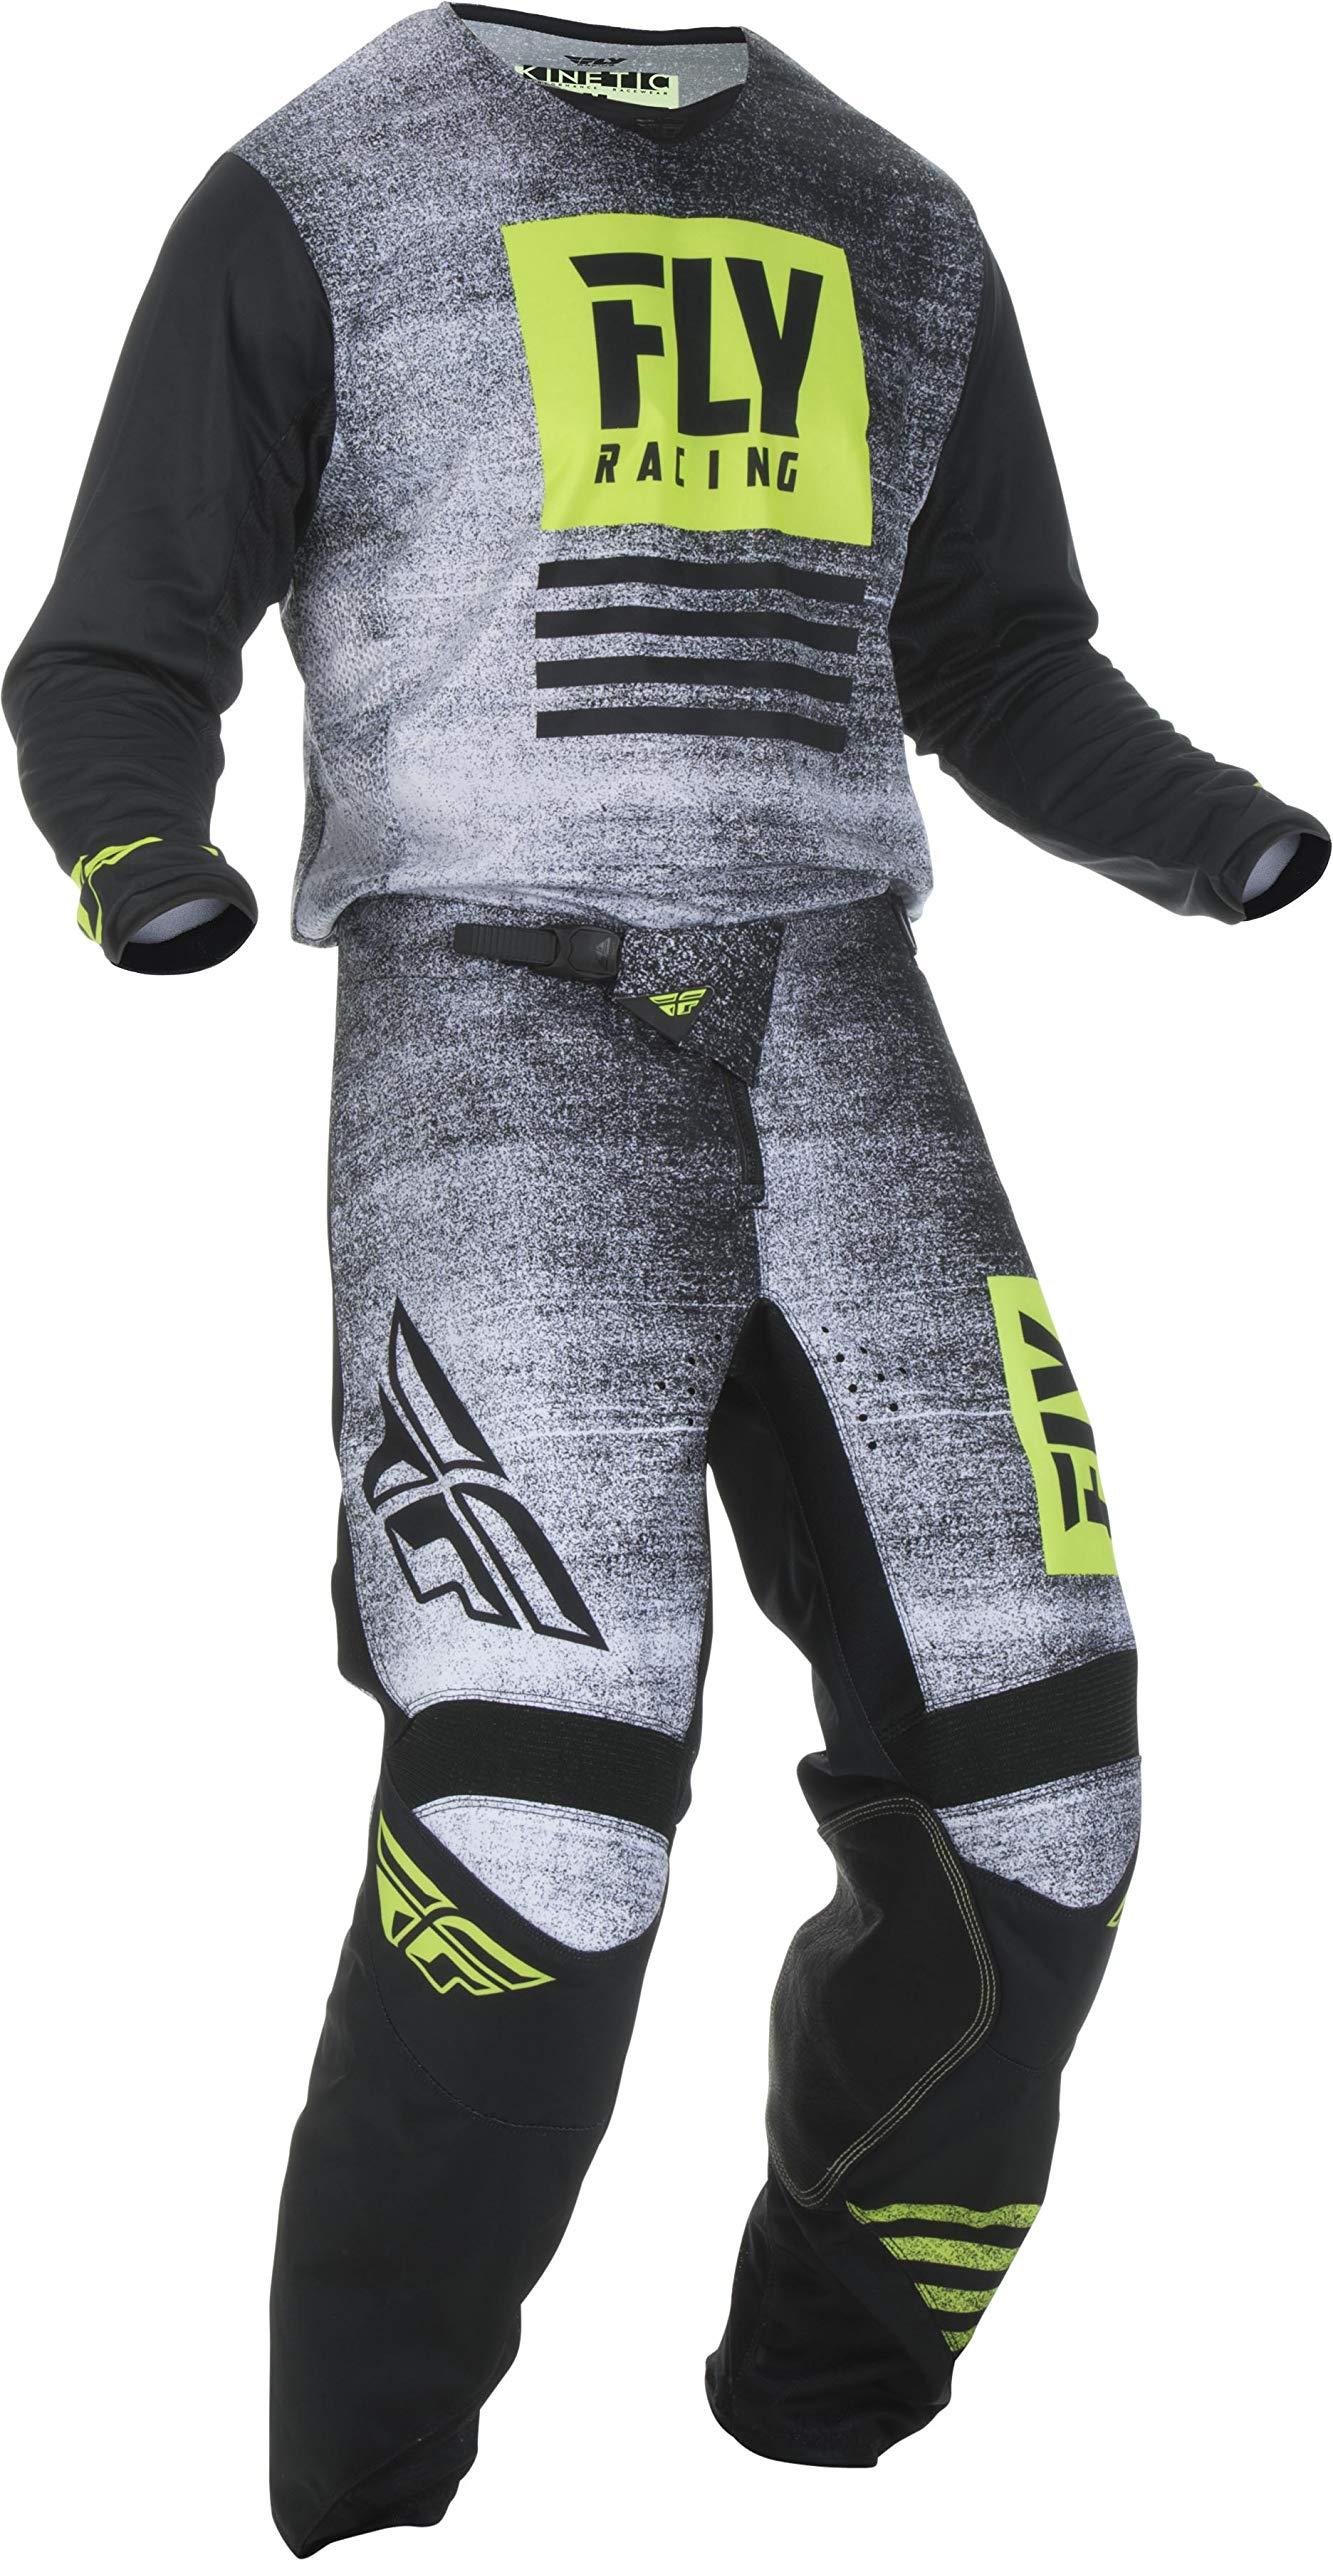 Fly Racing - 2019 Kinetic Noiz (Mens Black & HI-VIS Large/34W) MX Riding Gear Combo Set, Motocross Off-Road Dirt Bike Light Weight Durable Jersey & Mesh Comfort Liner Stretch Pre Shaped Knees Pant